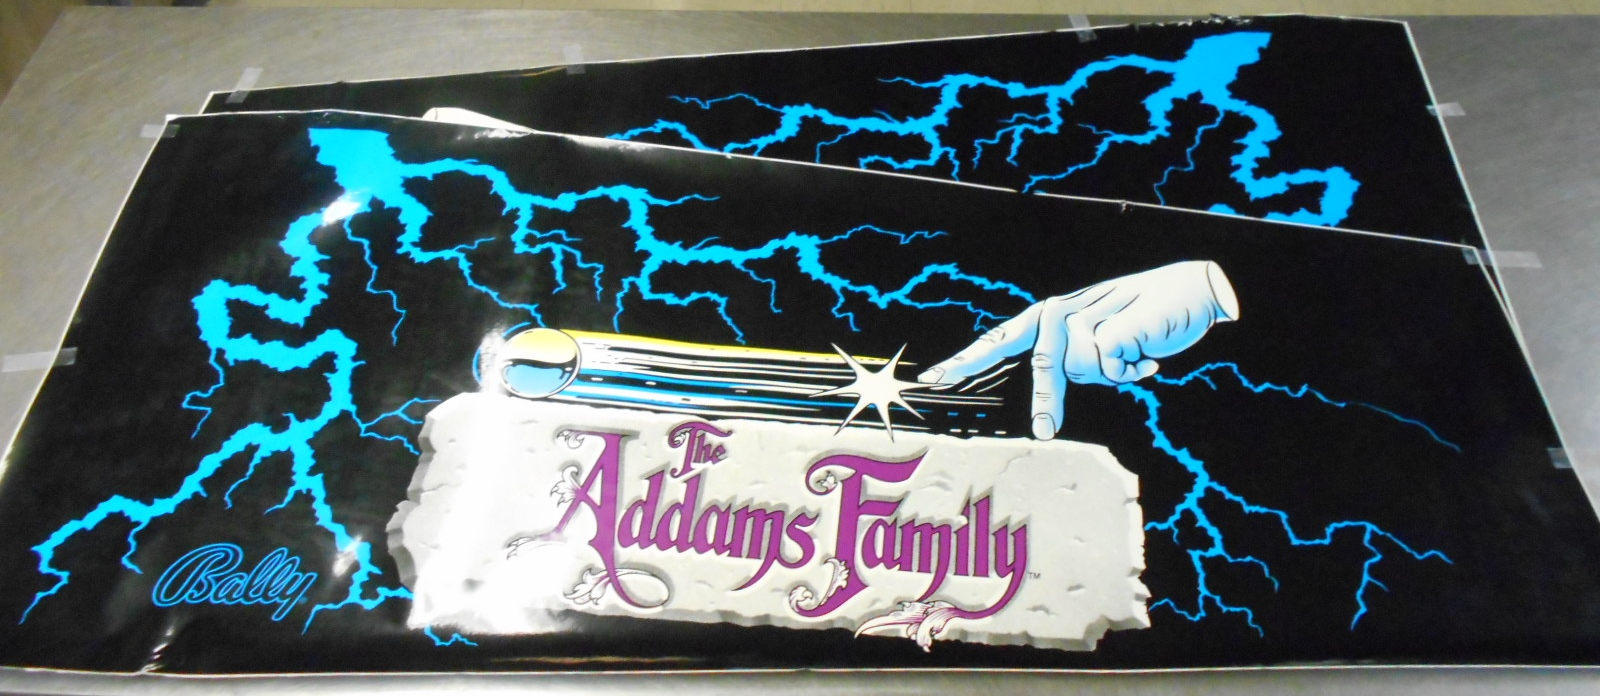 Addams Family Pinball Machine Game Cabinet Artwork 3 Piece